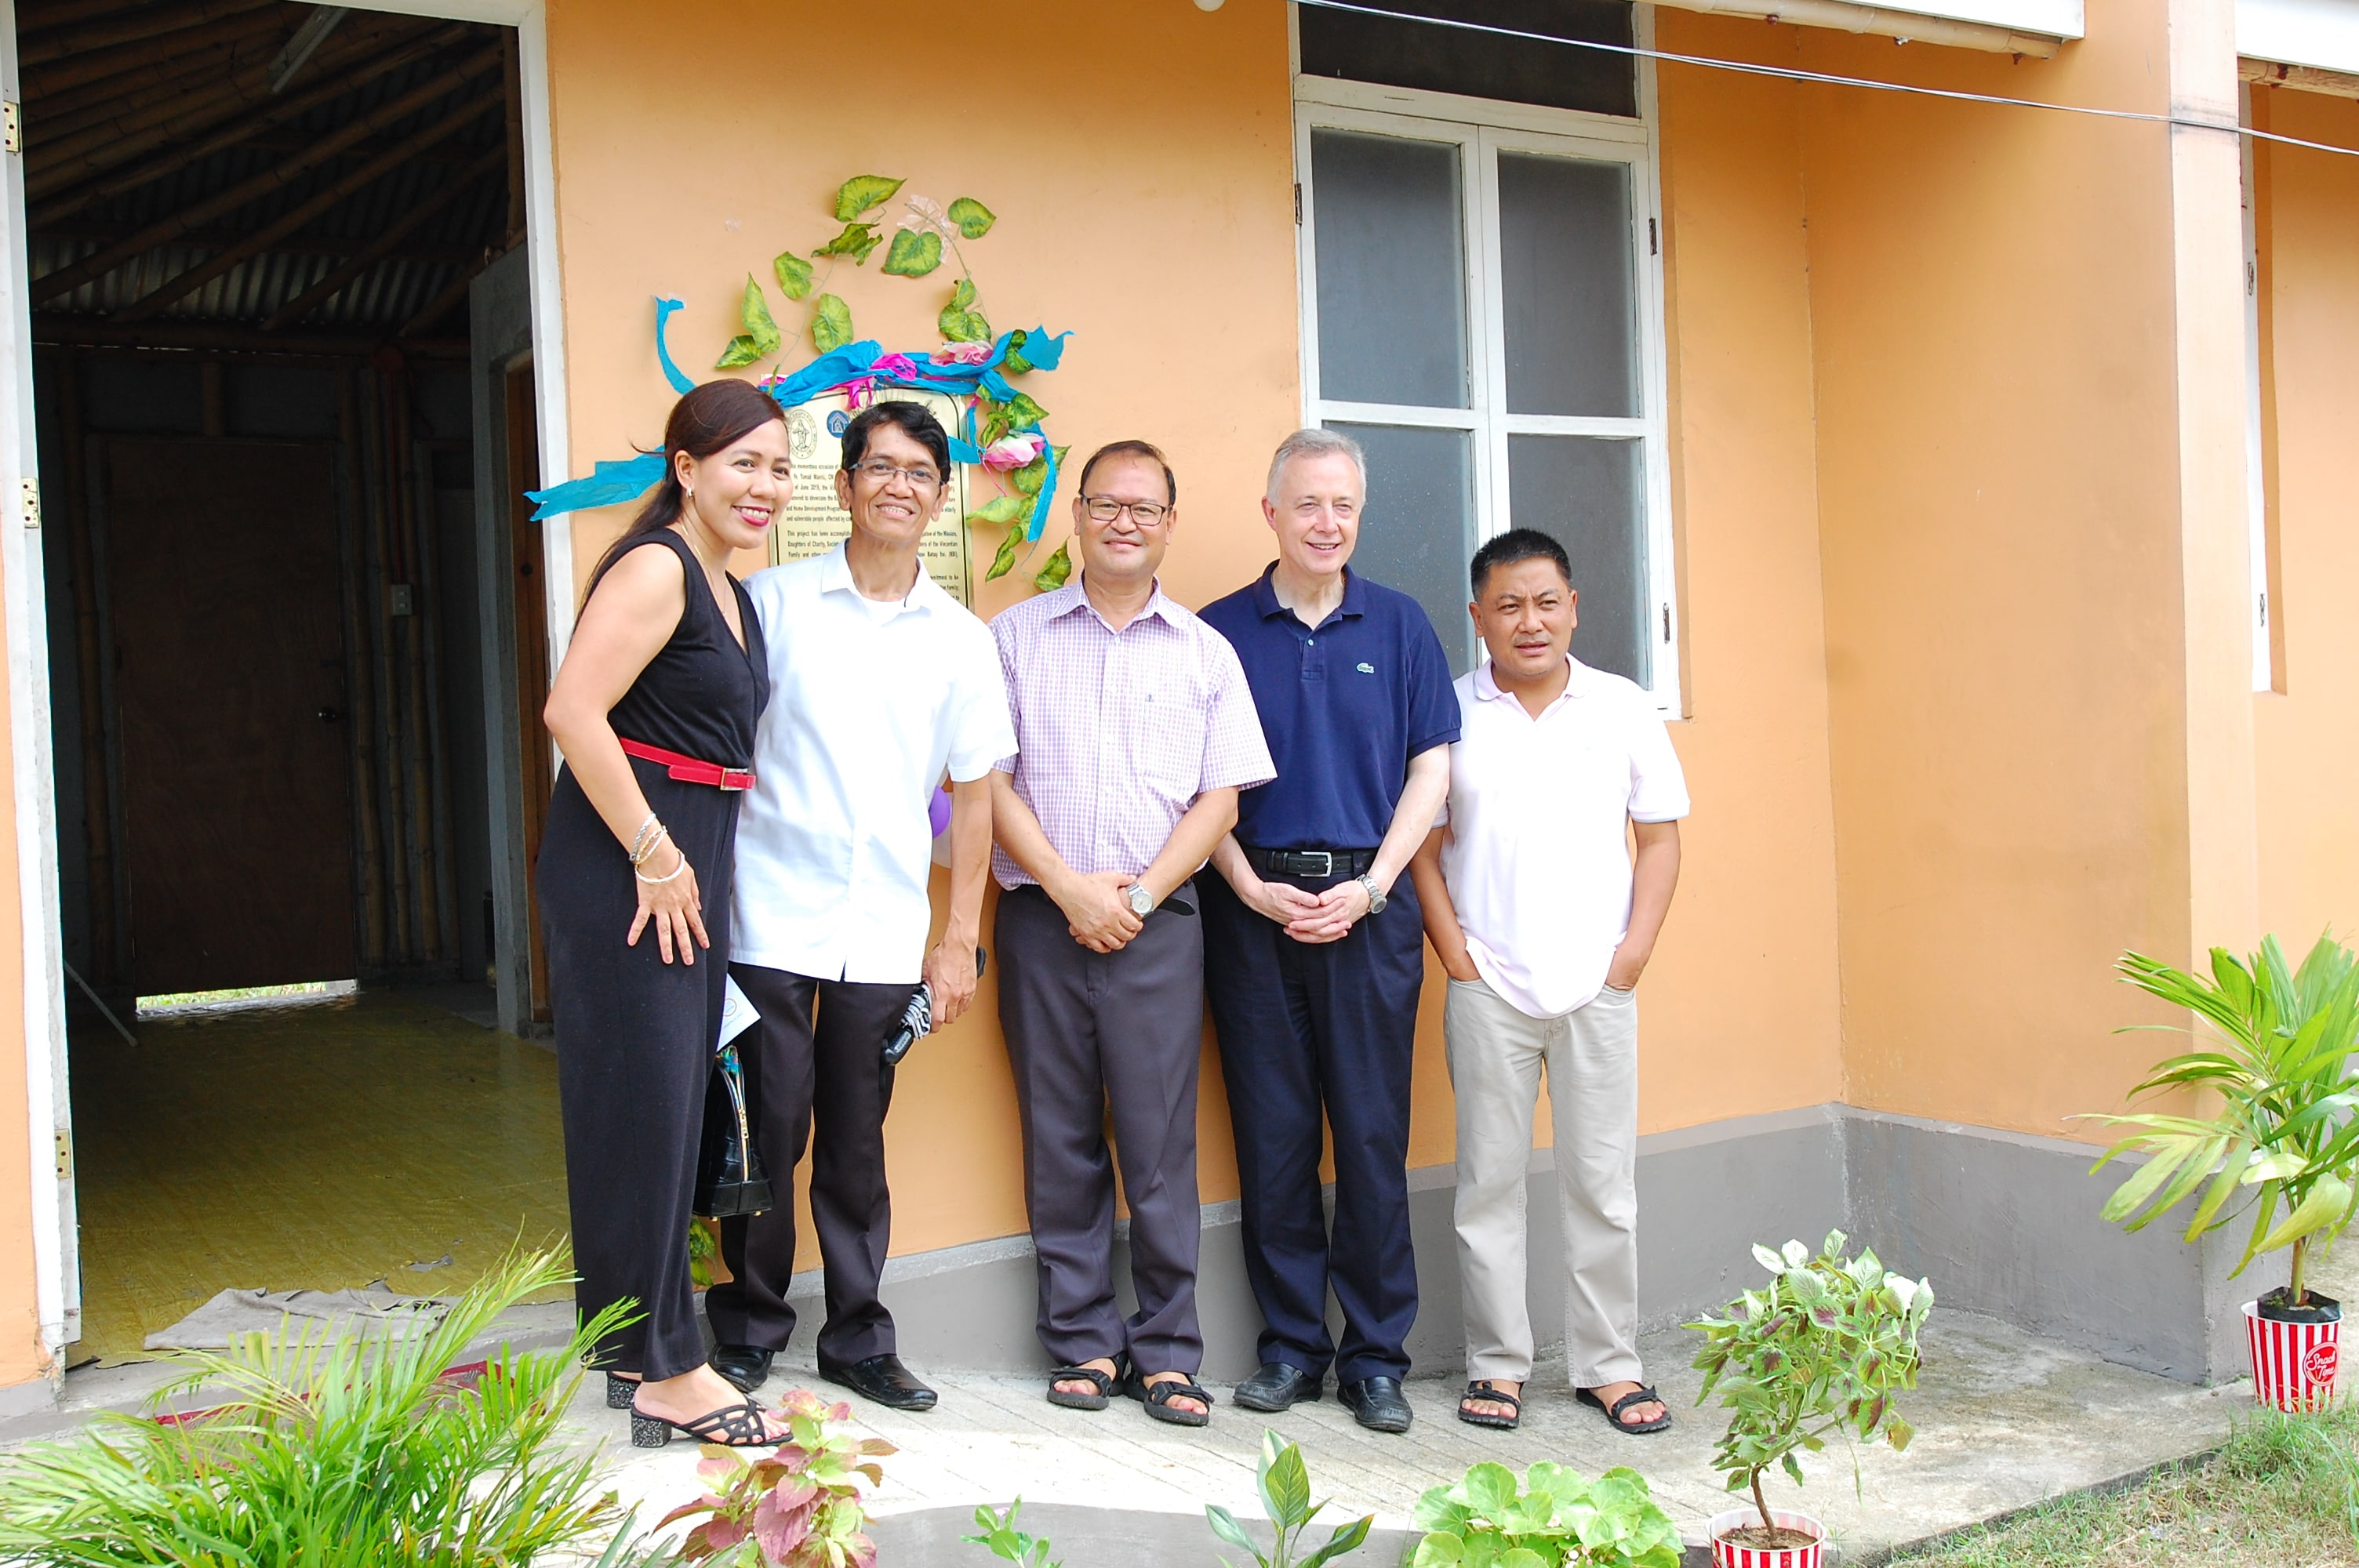 P. Mario Castillo, CM, P. Gregg Bañaba, Fr. Tomaž Mavrič, Fr. Gerald Borja,